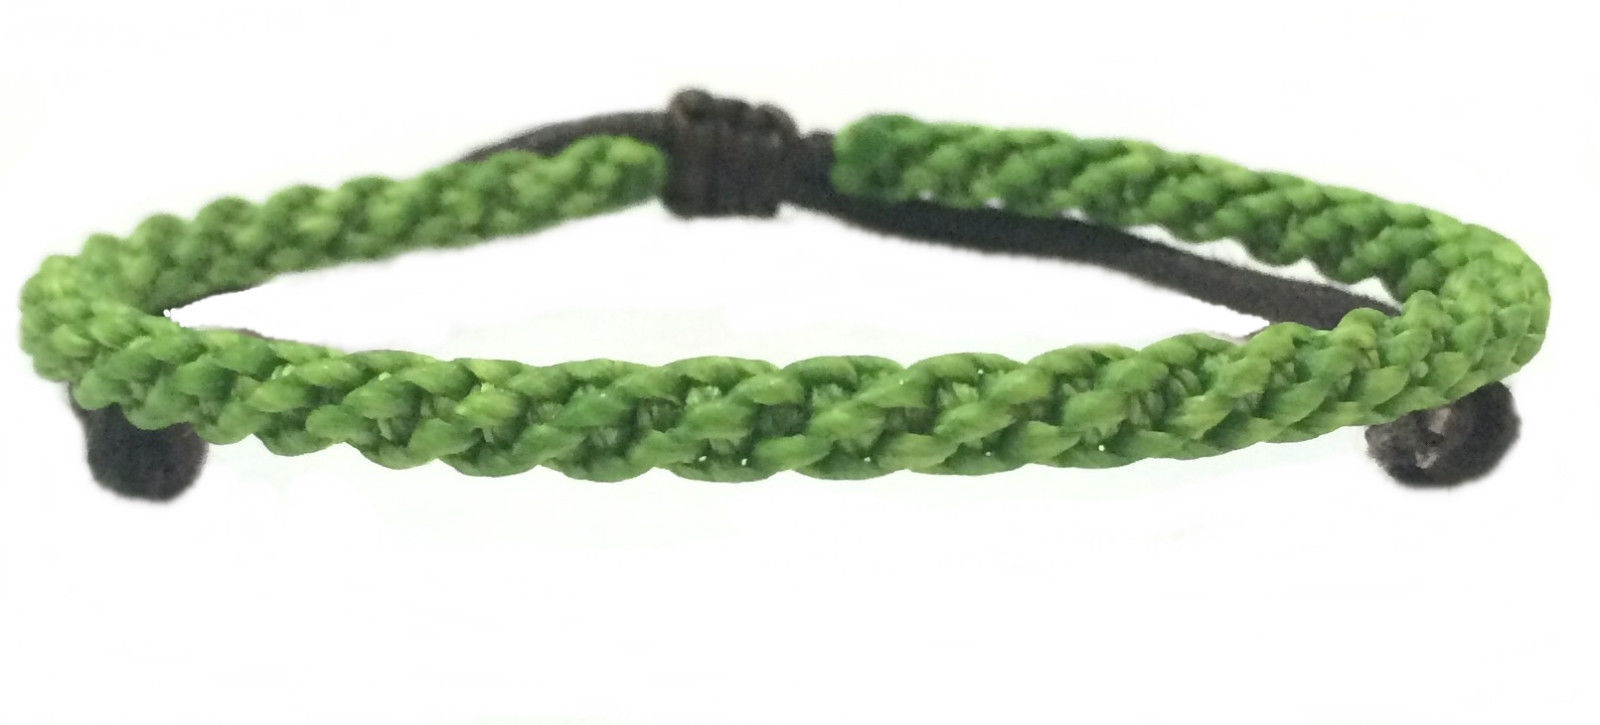 Braided Men's Wax Cotton Thai Wristband Bracelet Handcrafted Classic Wristwear